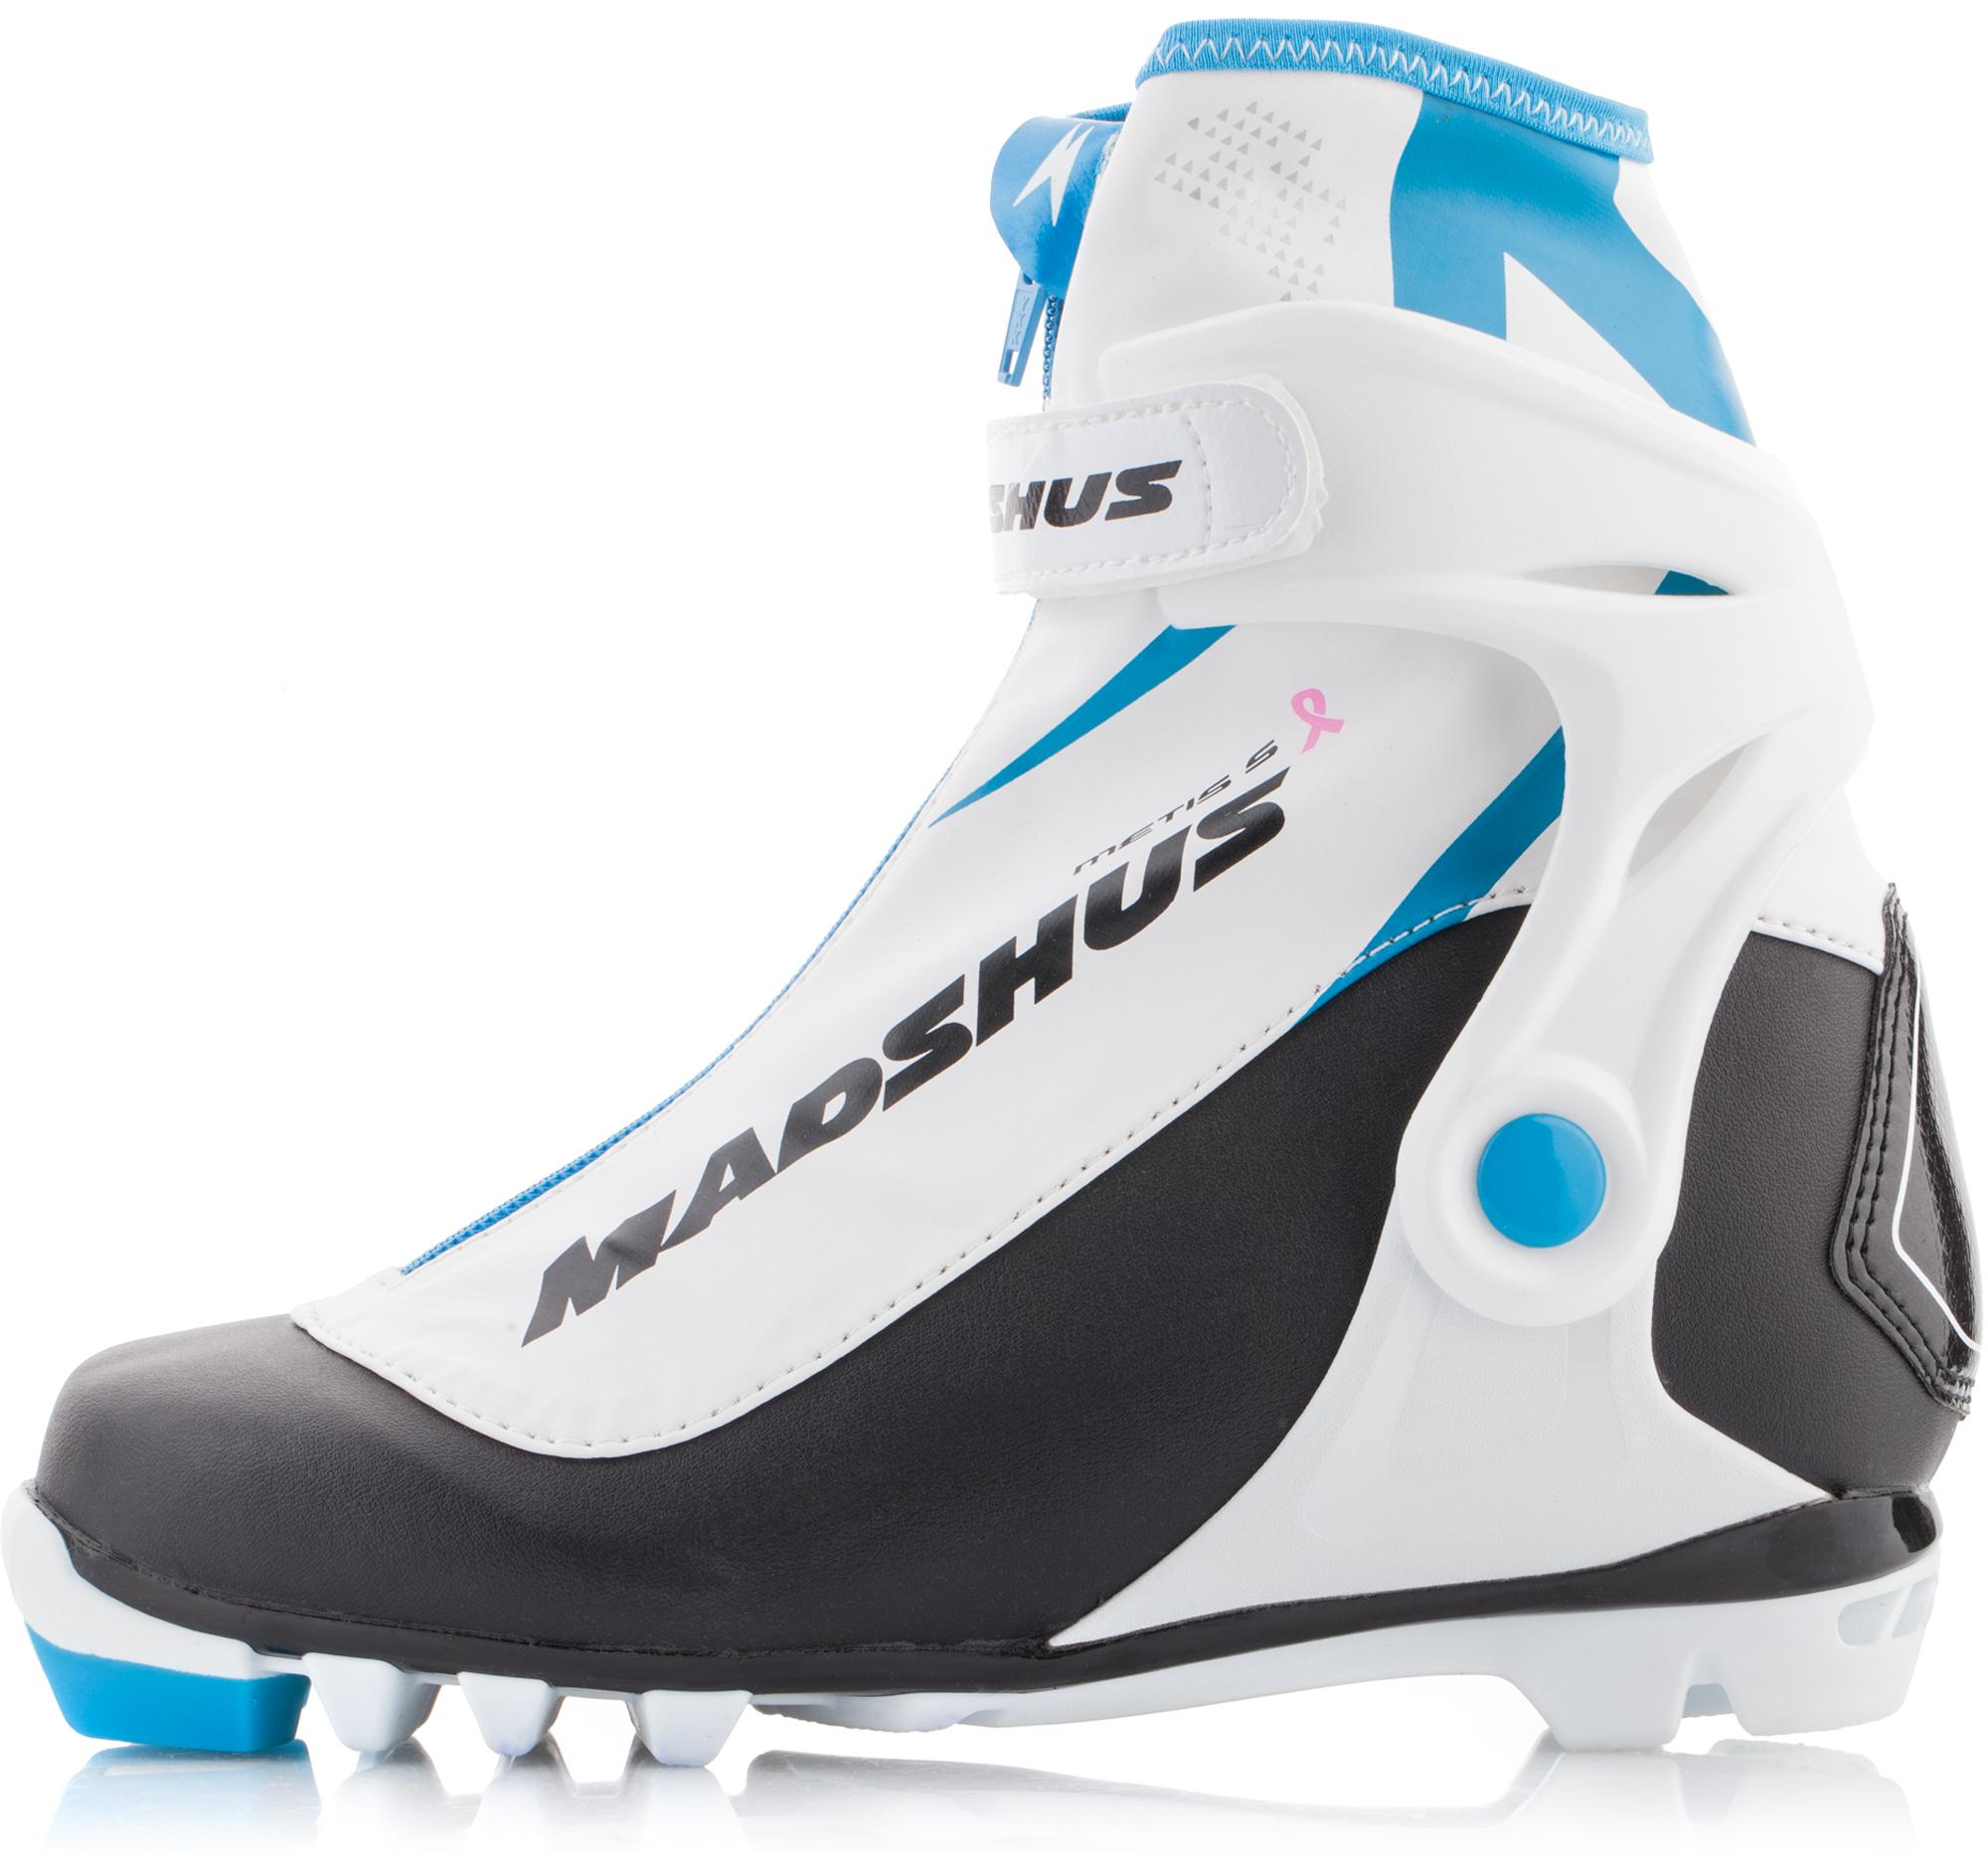 Madshus Ботинки для беговых лыж женские Madshus Metis S